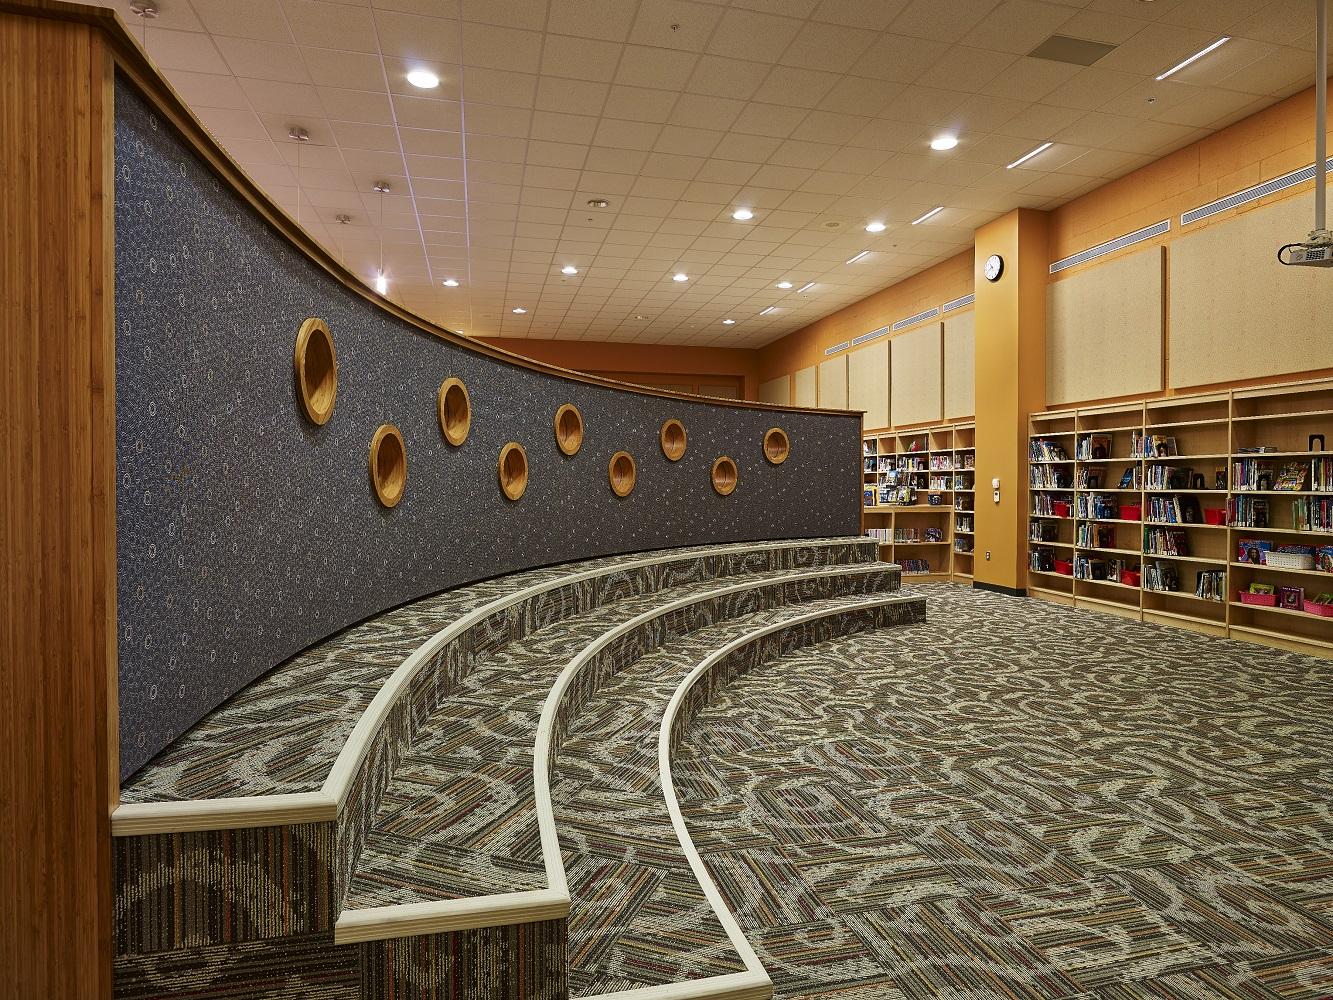 Interior - Library Reading Area.jpg